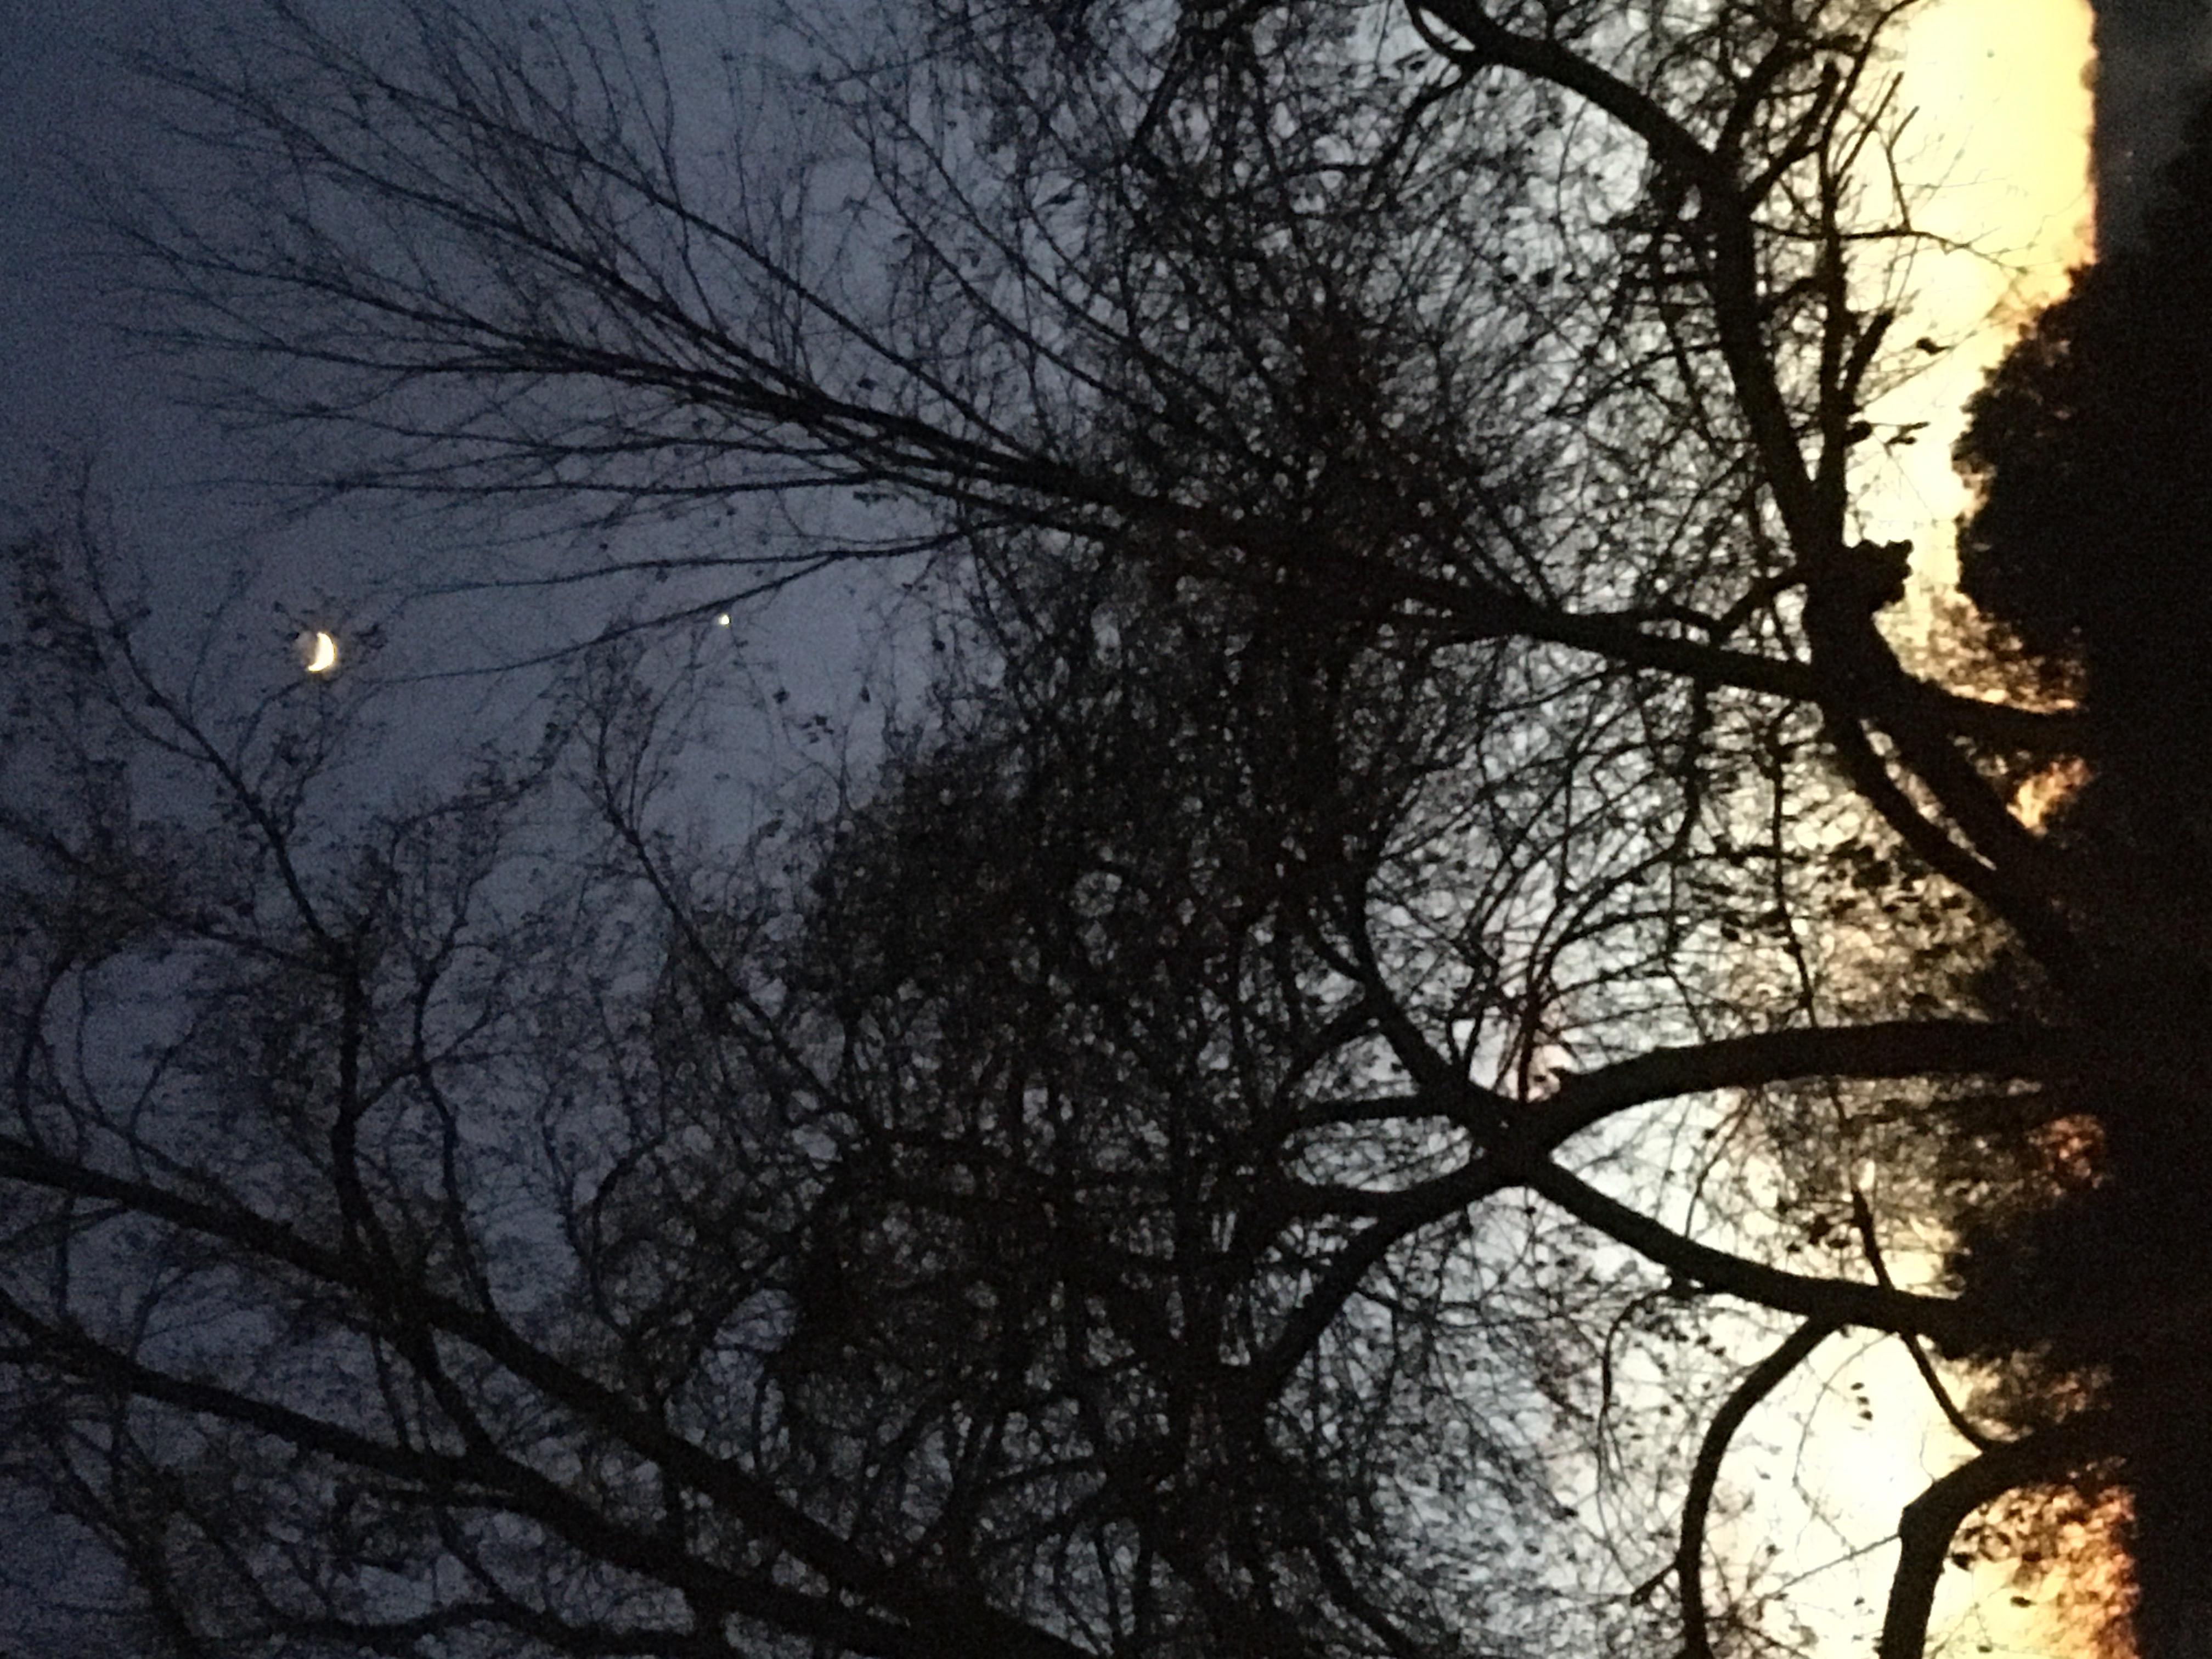 Seeing the Sky by DJWM